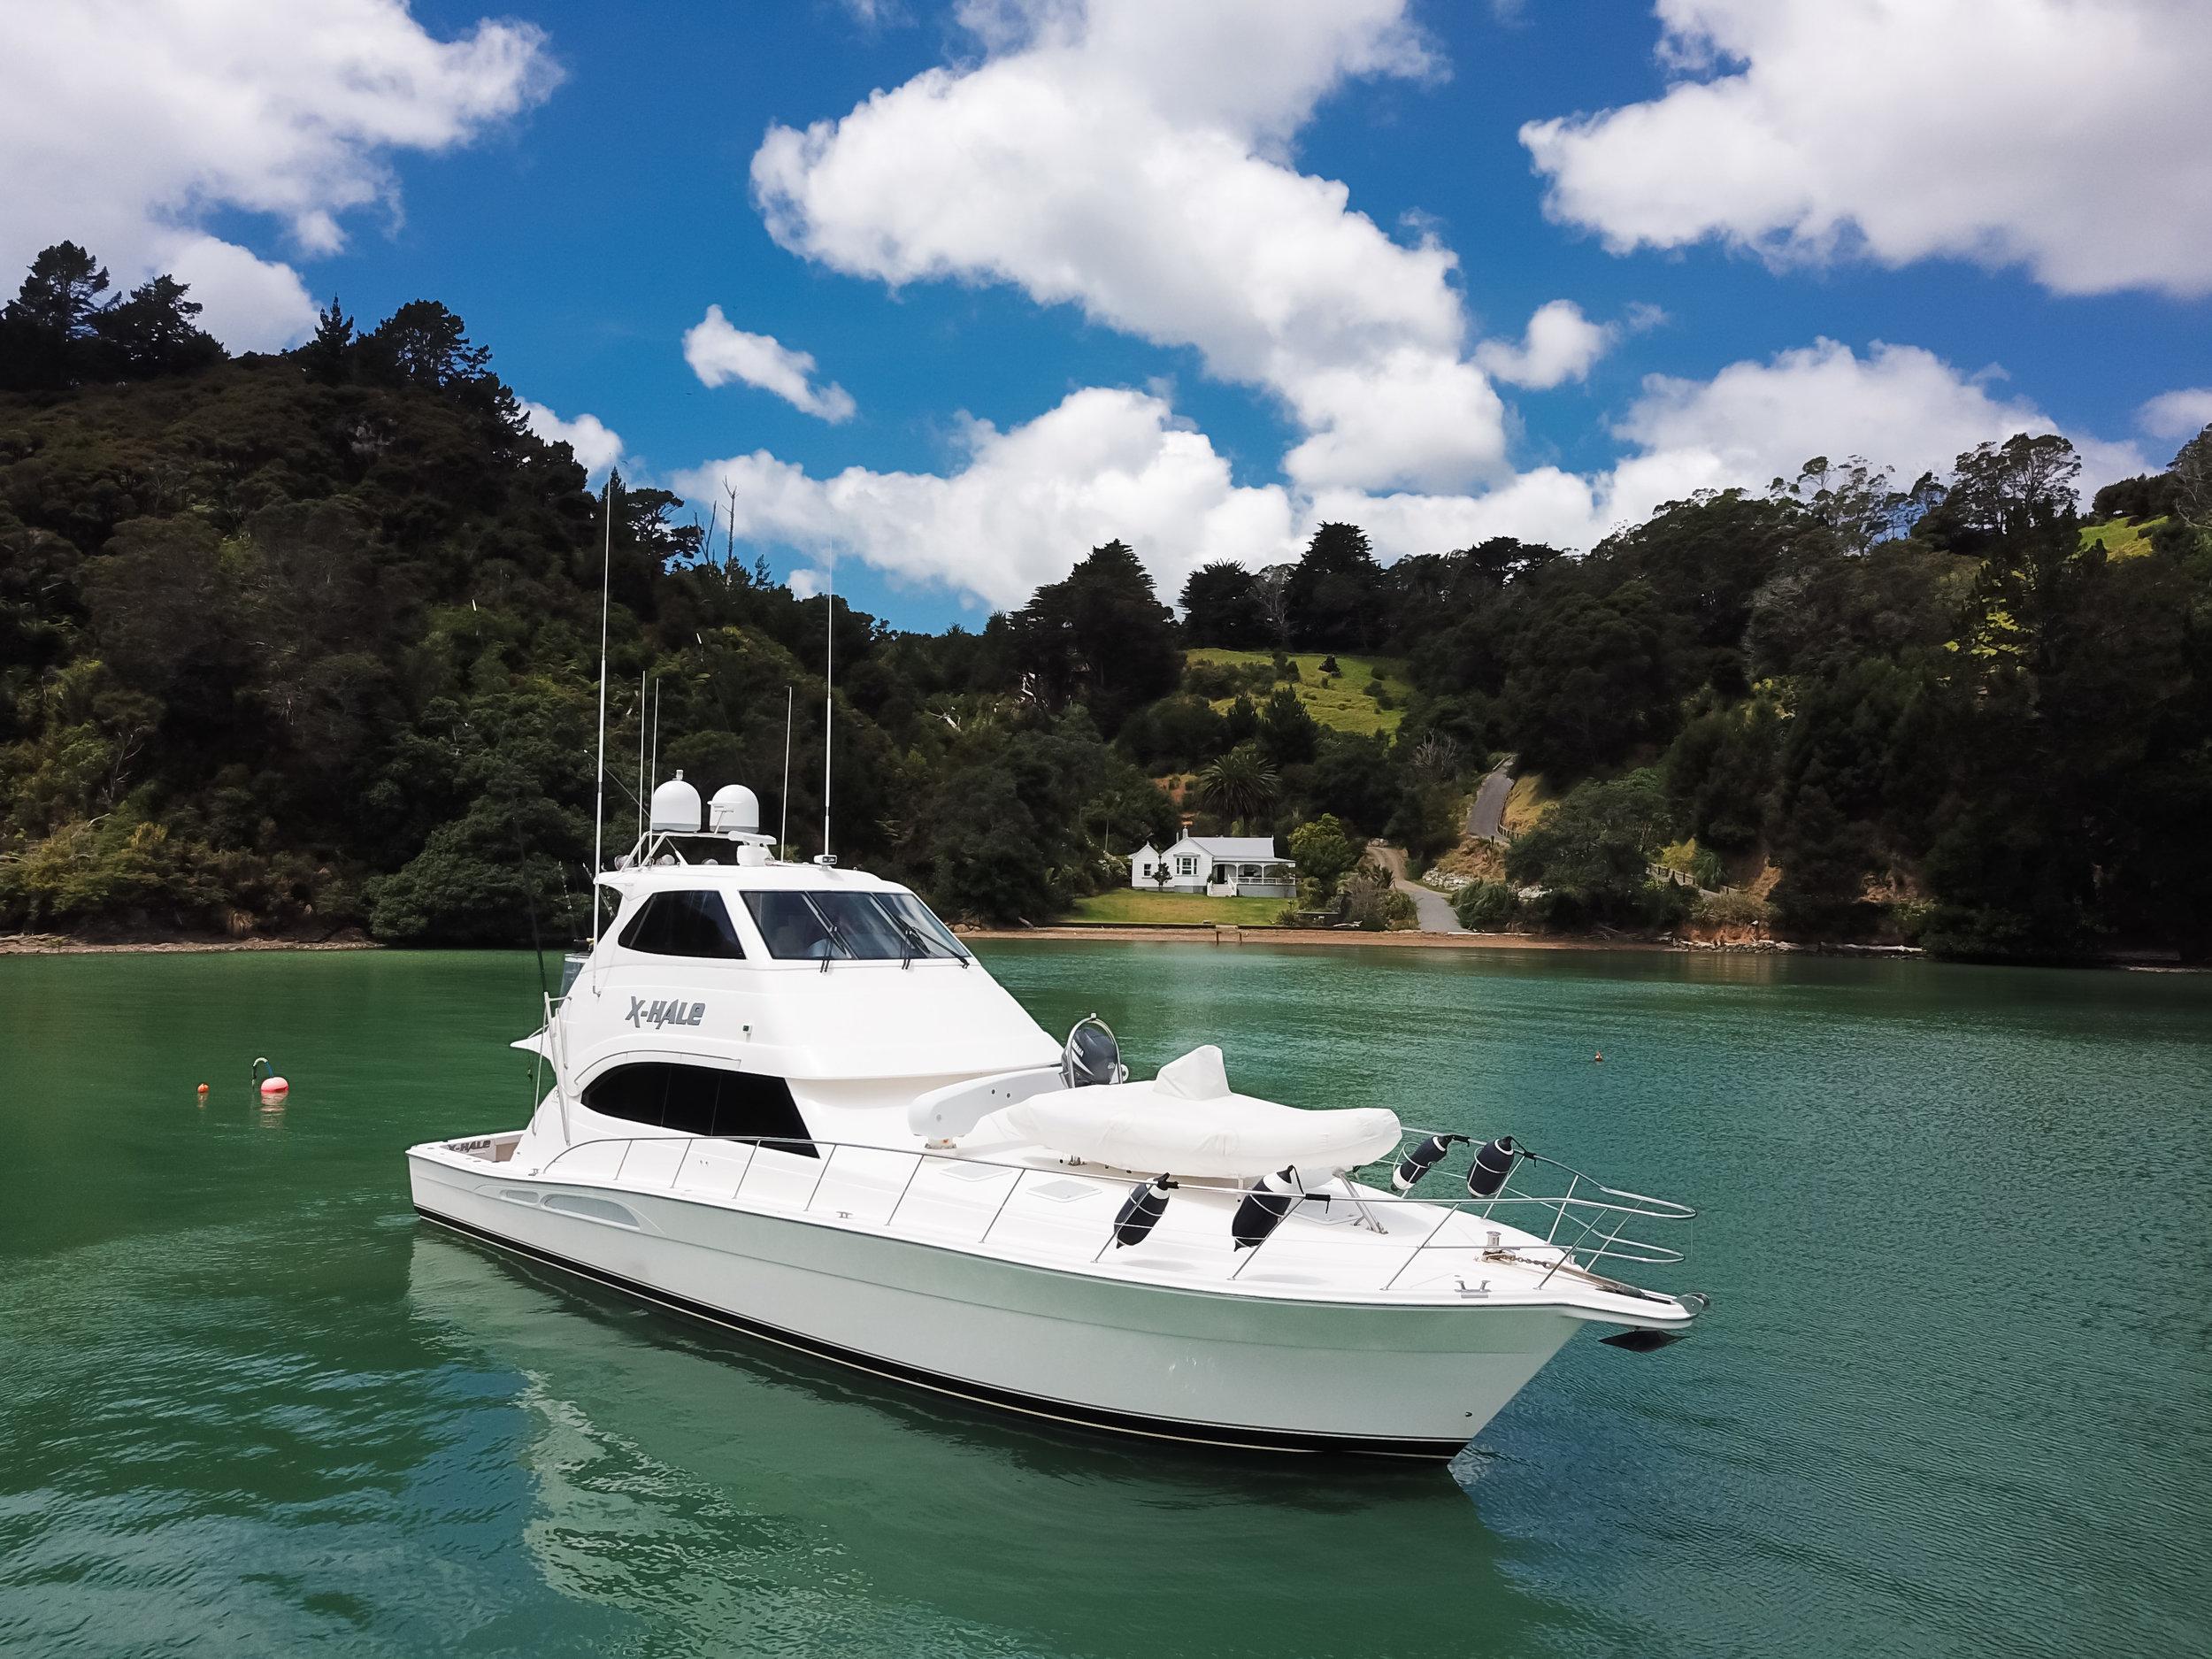 13_Marine Photography NZ.jpg